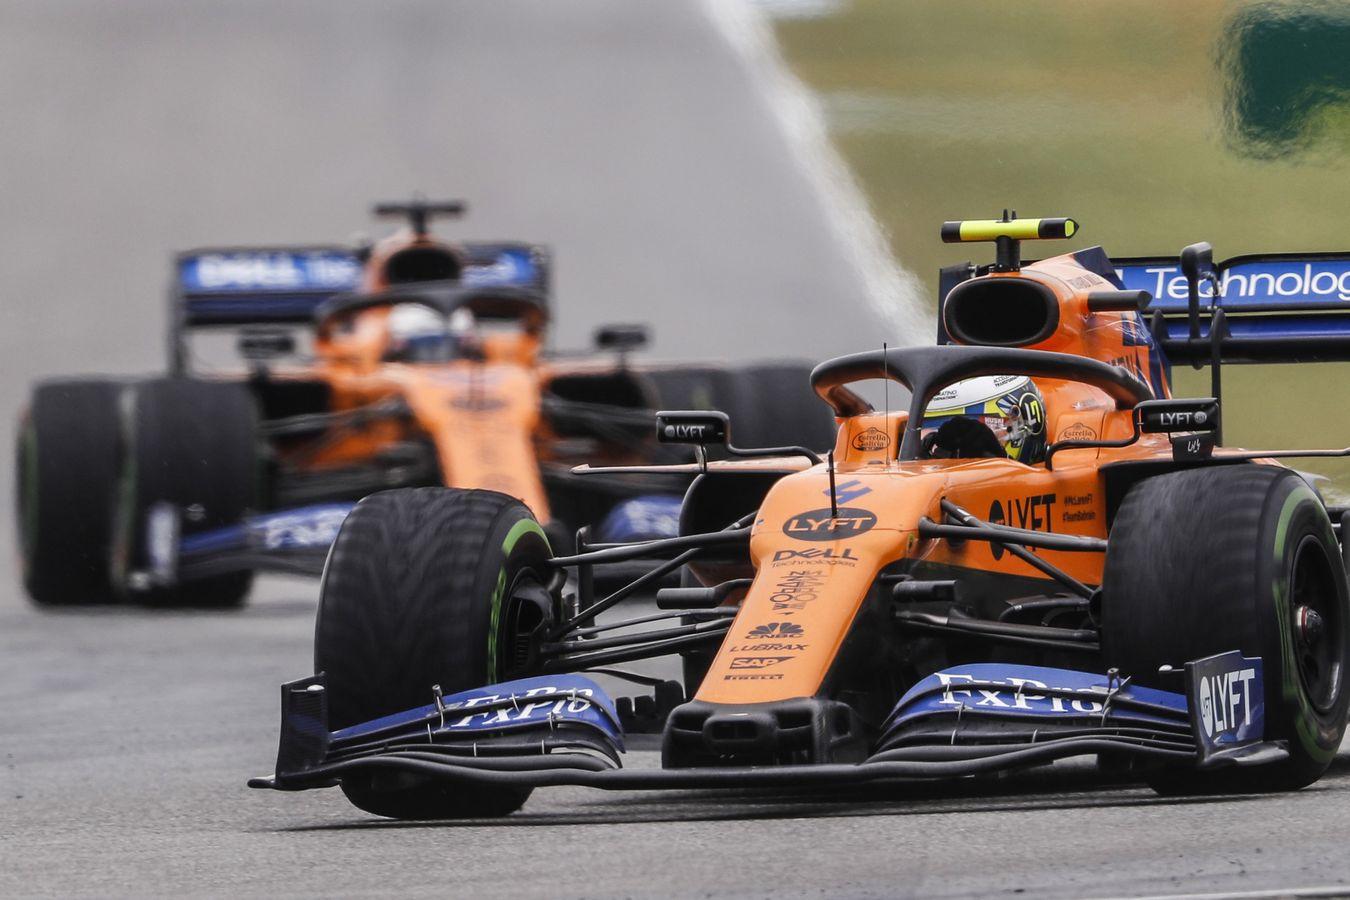 Mclaren Racing 2019 German Grand Prix